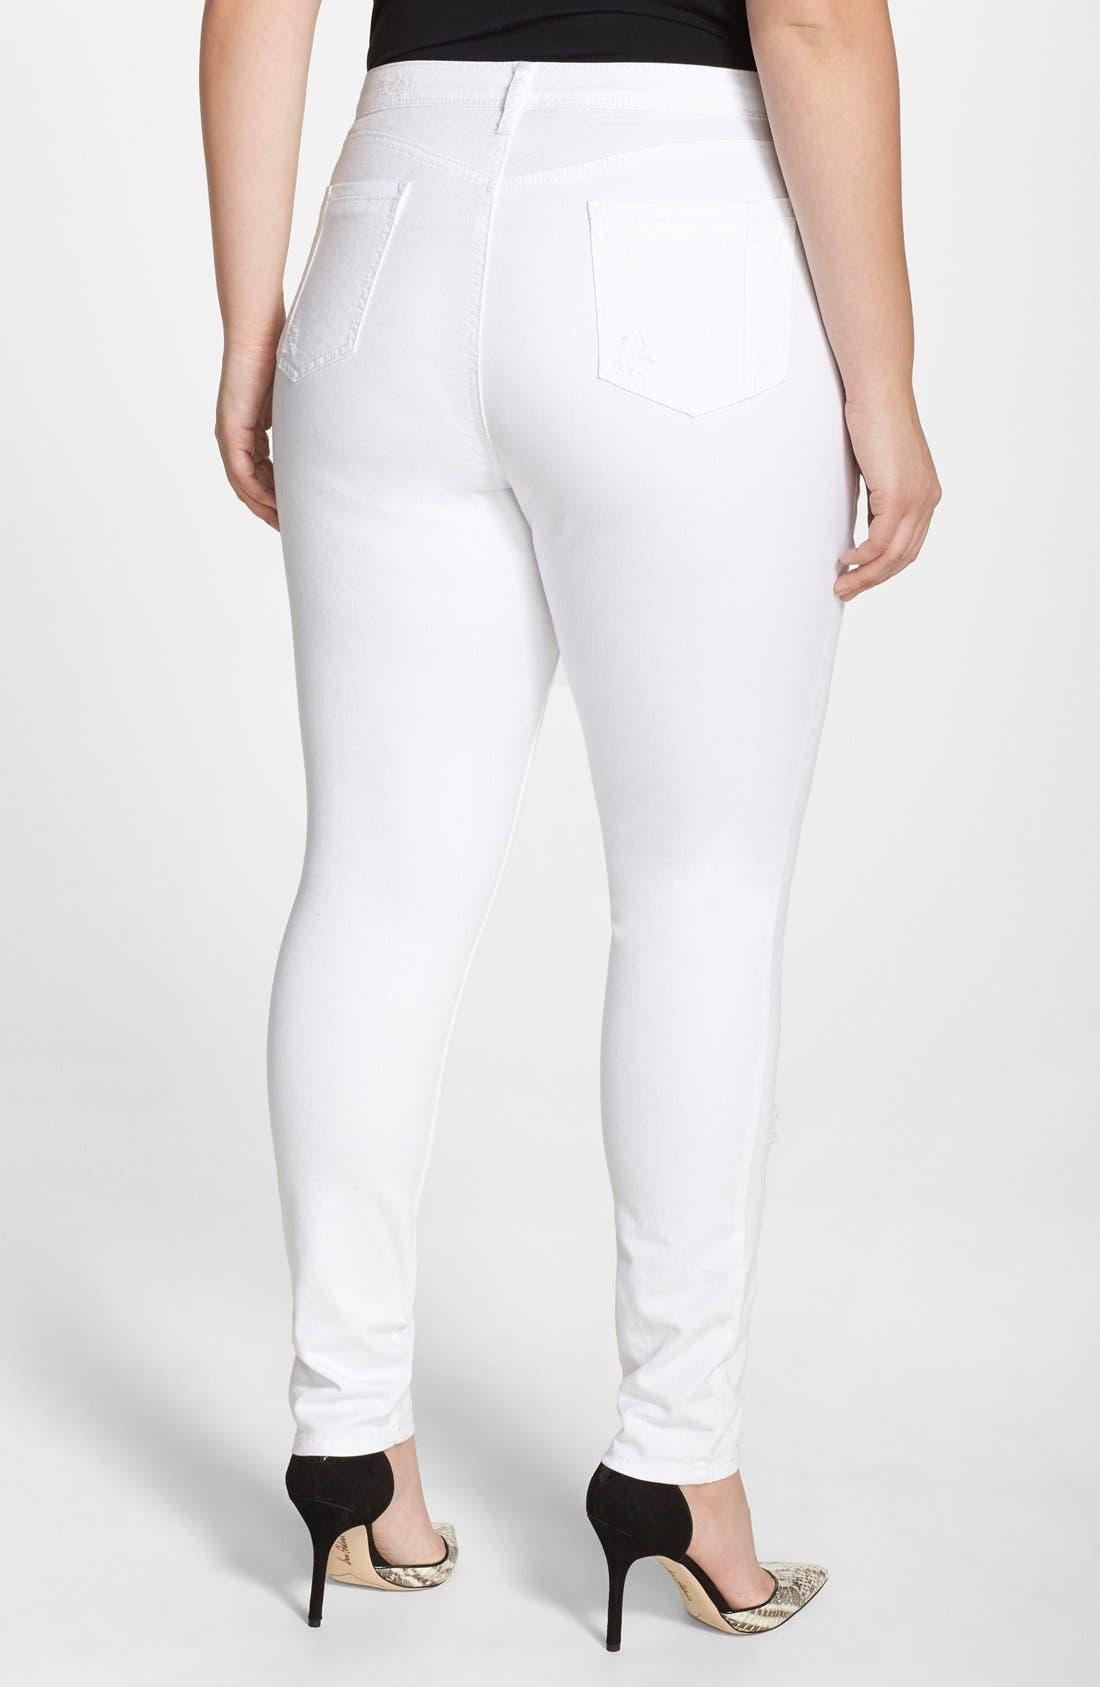 Alternate Image 2  - Poetic Justice 'Maya' Destroyed White Skinny Jeans (Plus Size)